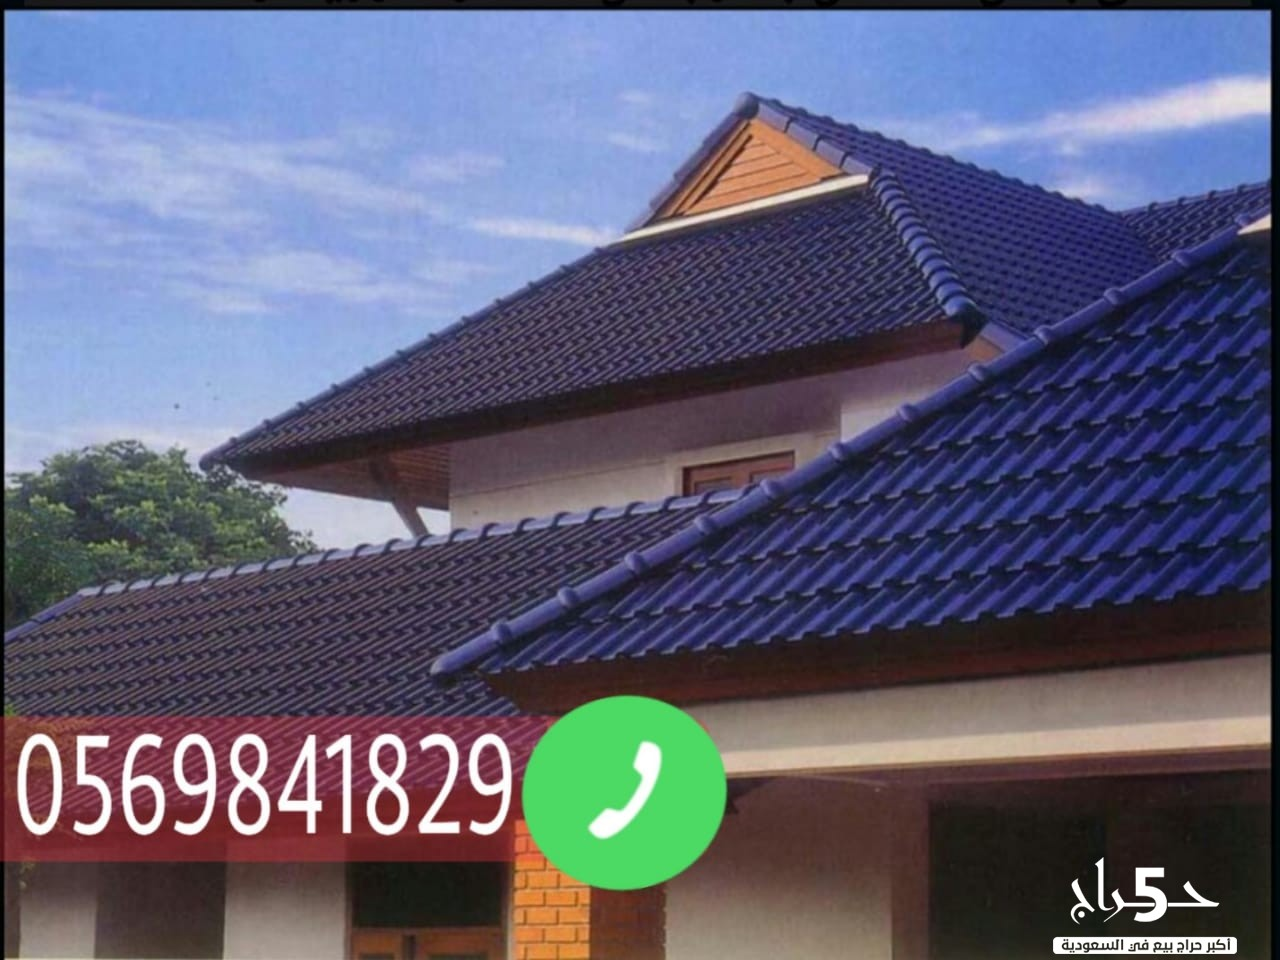 تركيب قرميد الطائف , تركيب اجود انواع قرميد, قرميد اسطح , قرميد منازل , 0569841829